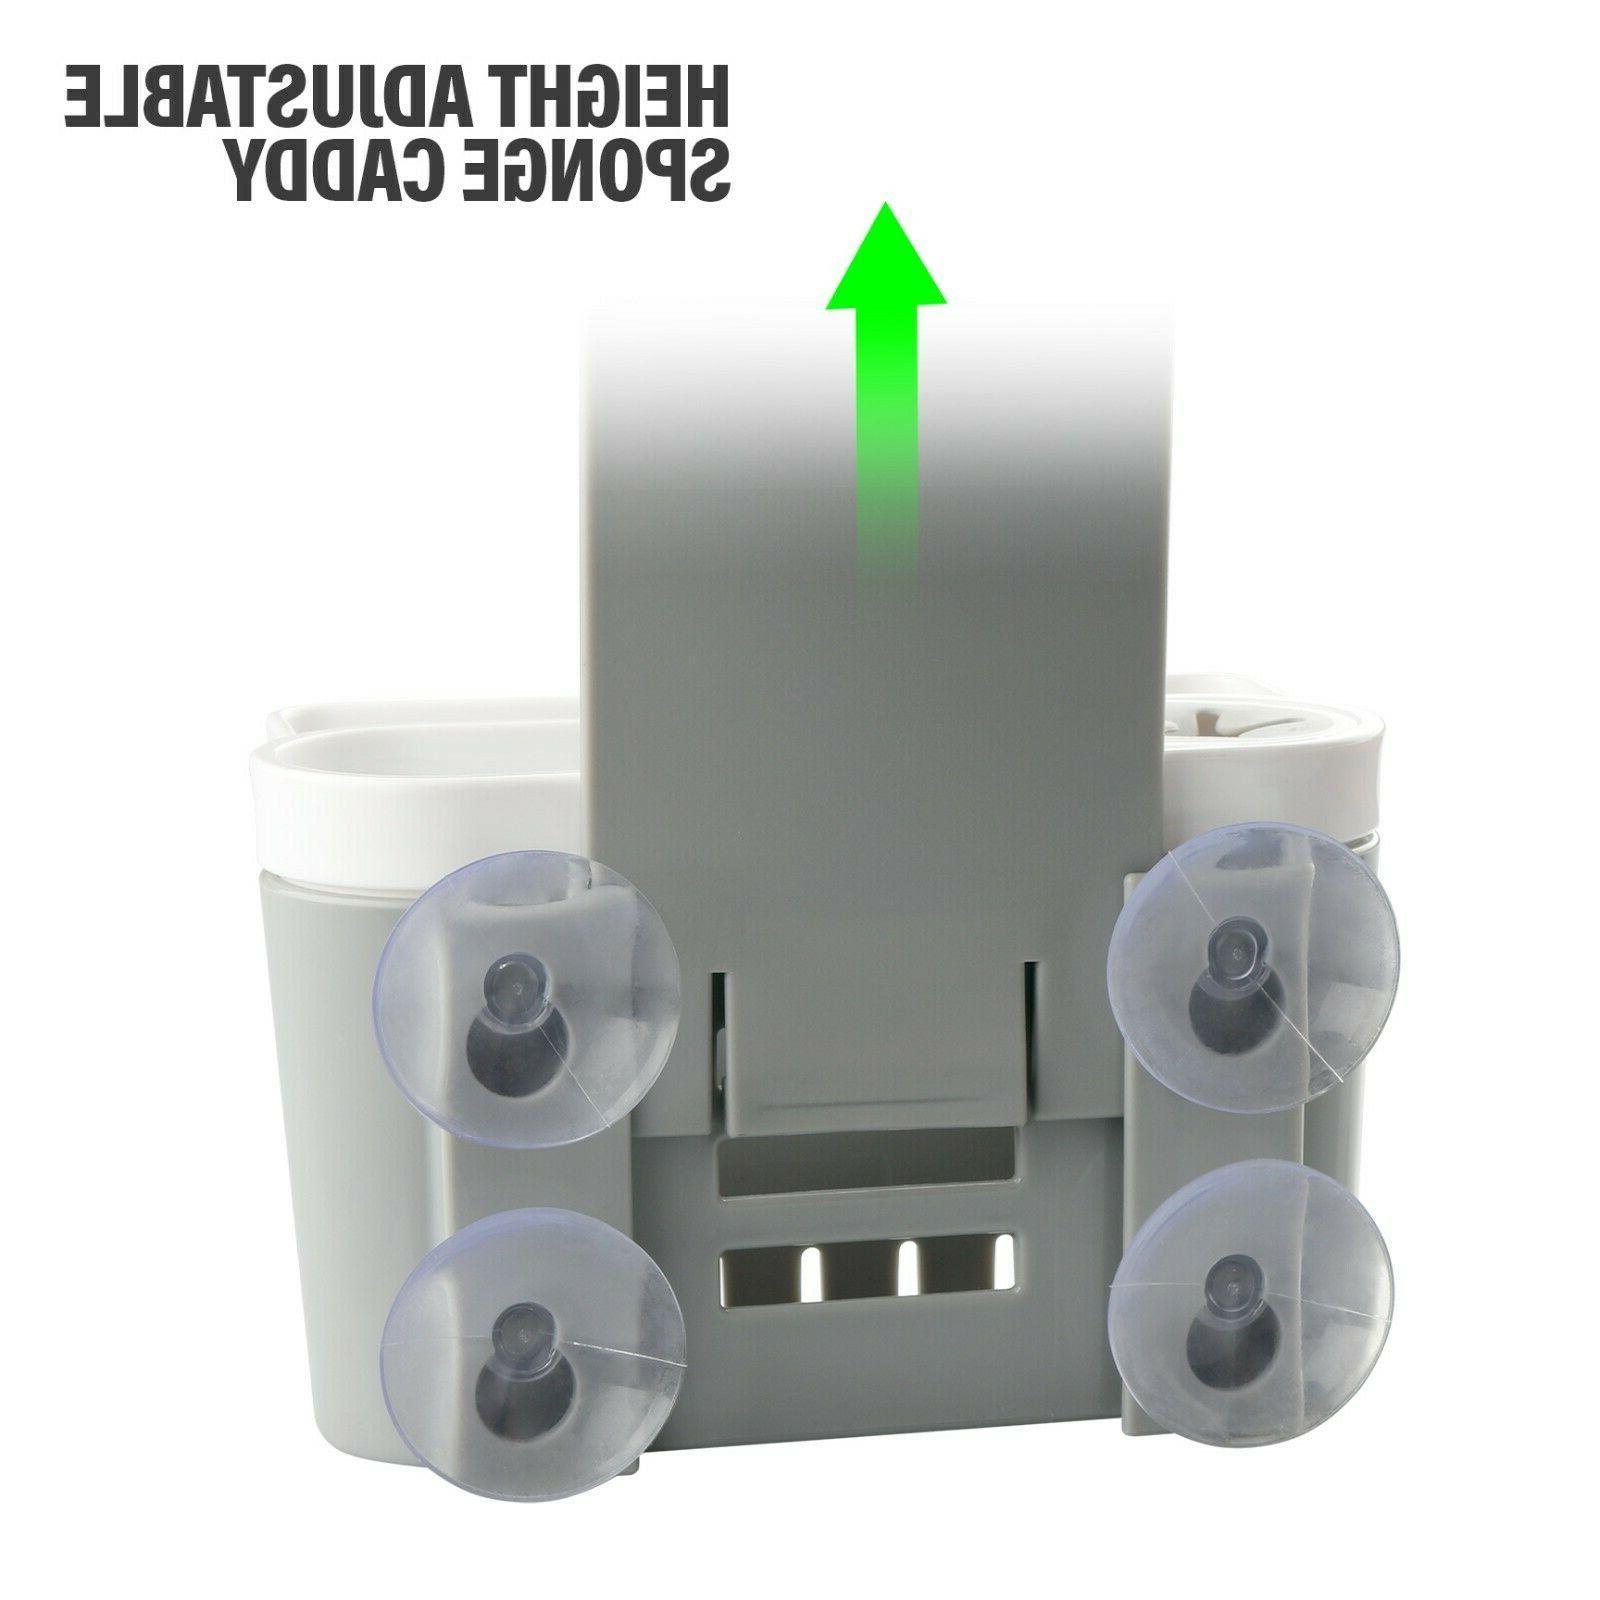 w/ Holder Soap Dispenser Caddy